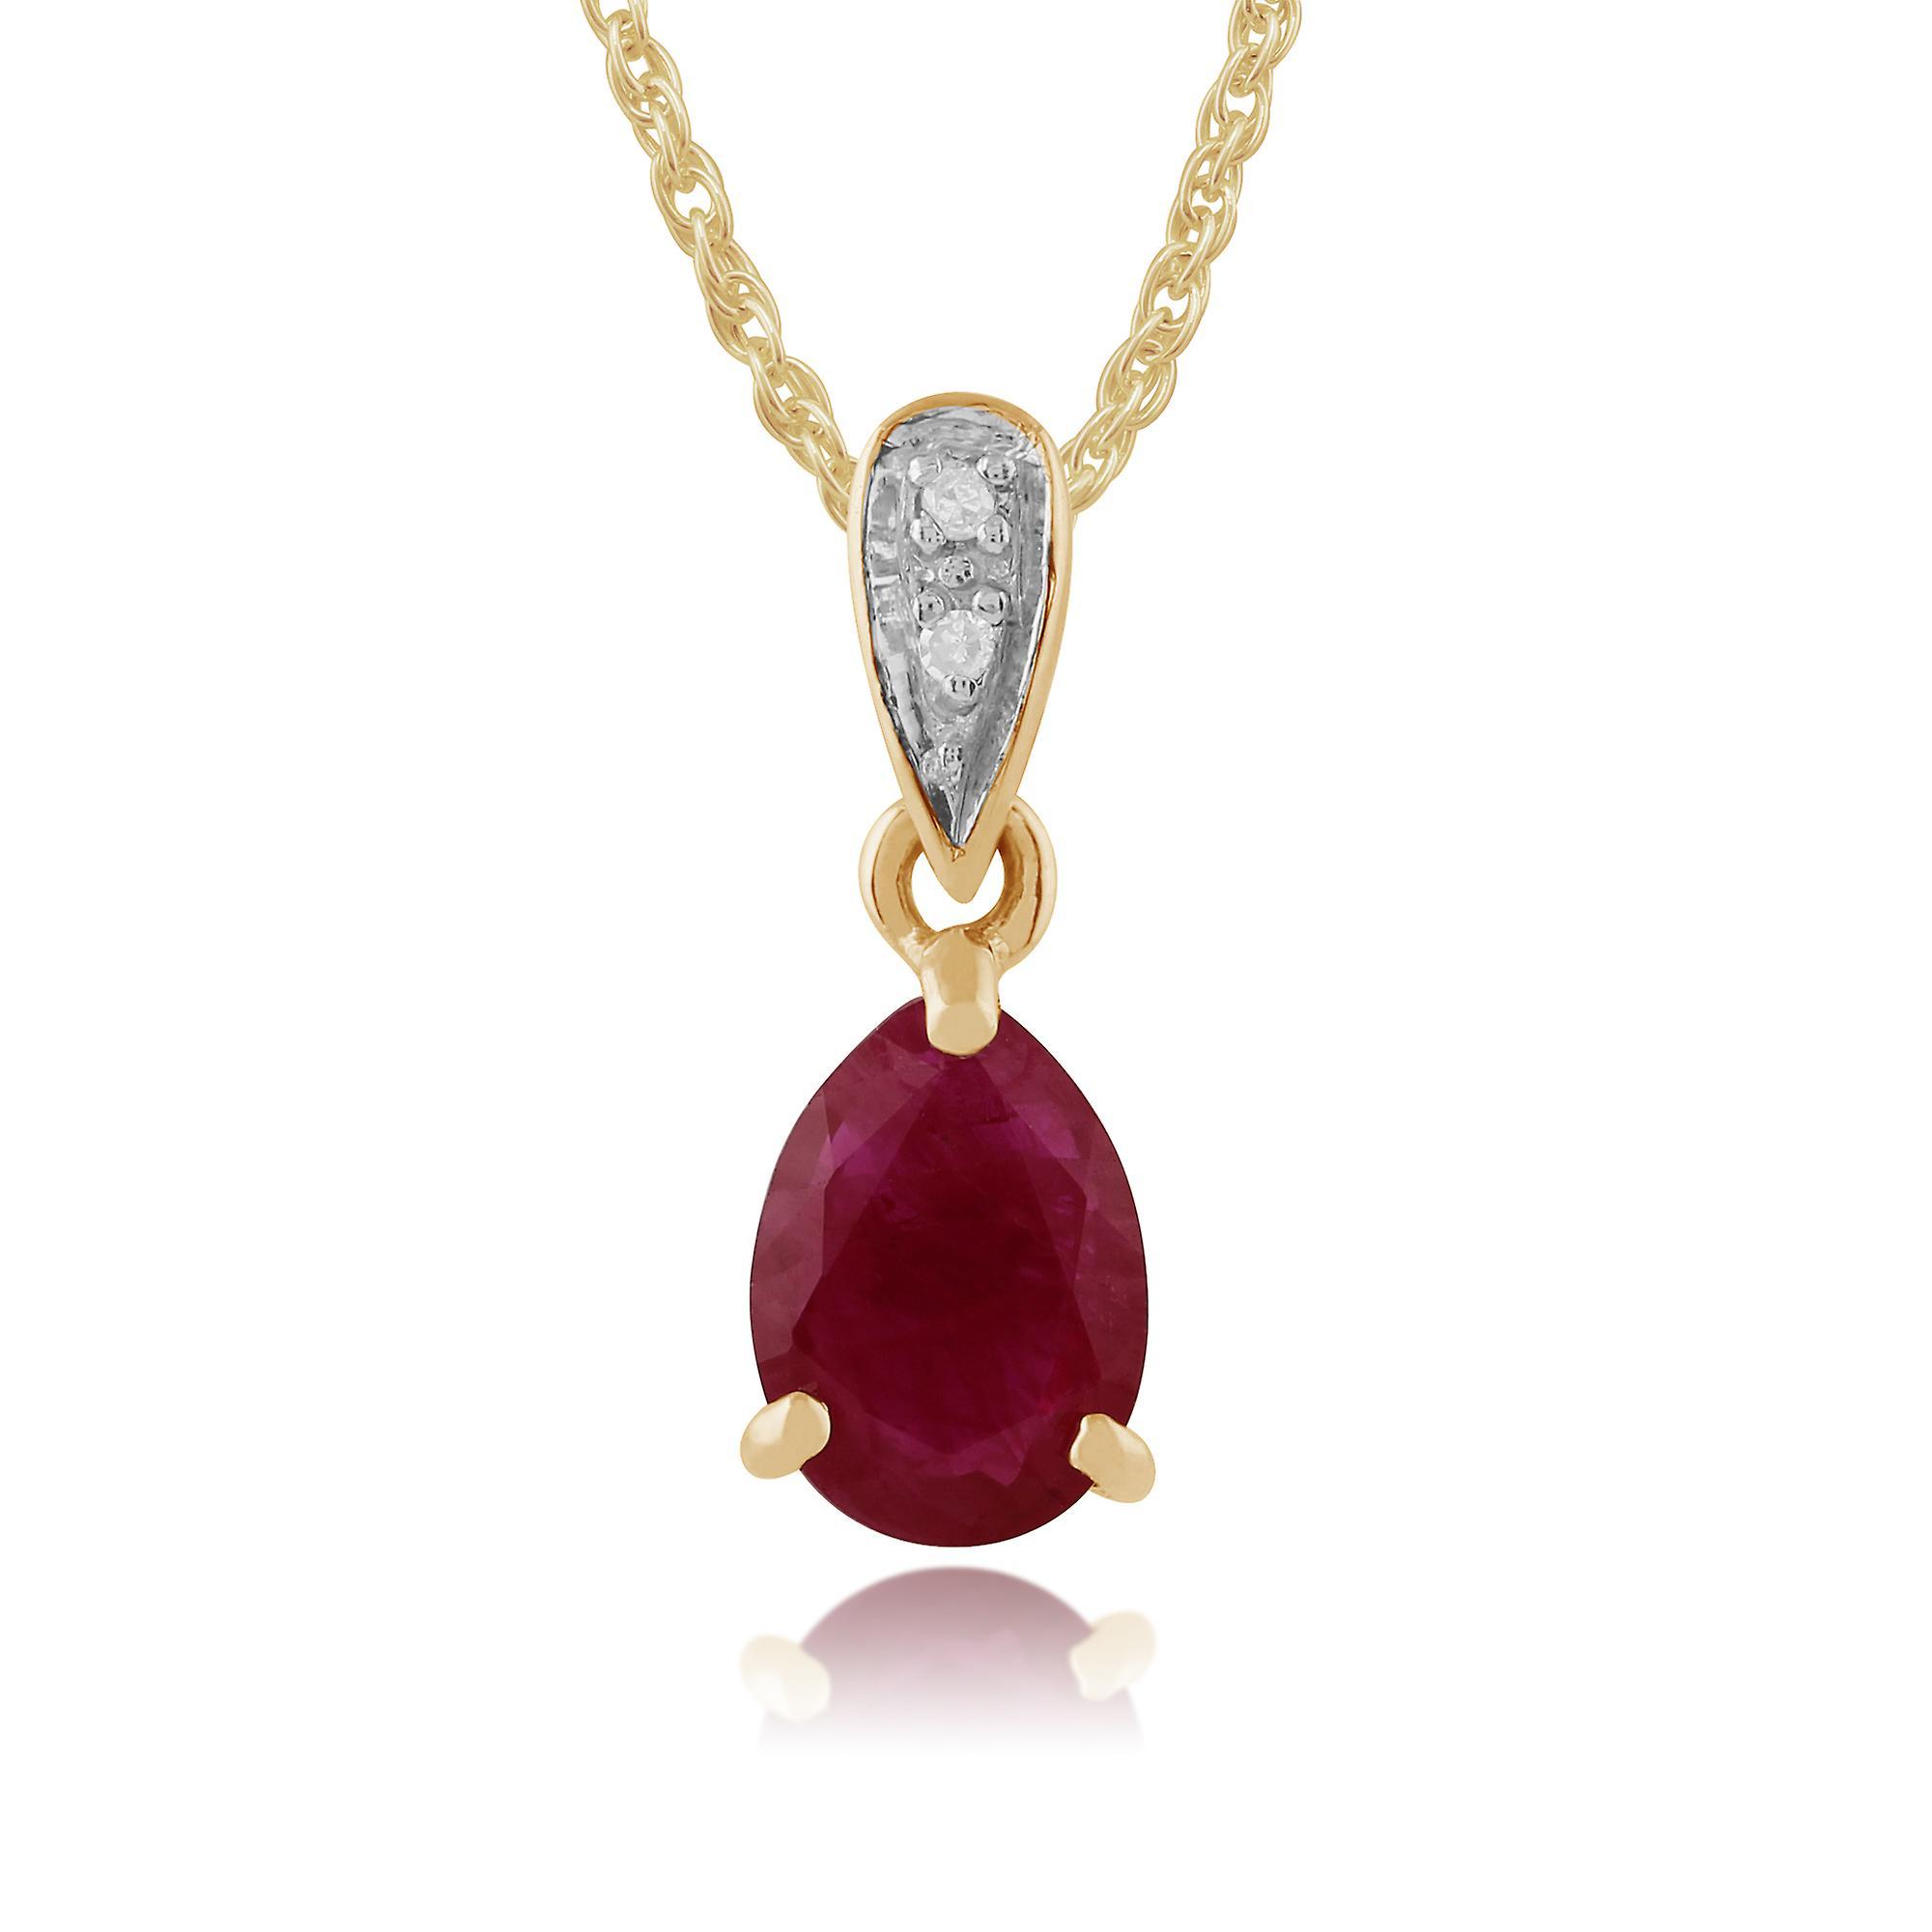 Gemondo 9ct Yellow Gold Ruby & Diamond Pear Drop Earrings & 45cm Necklace Set